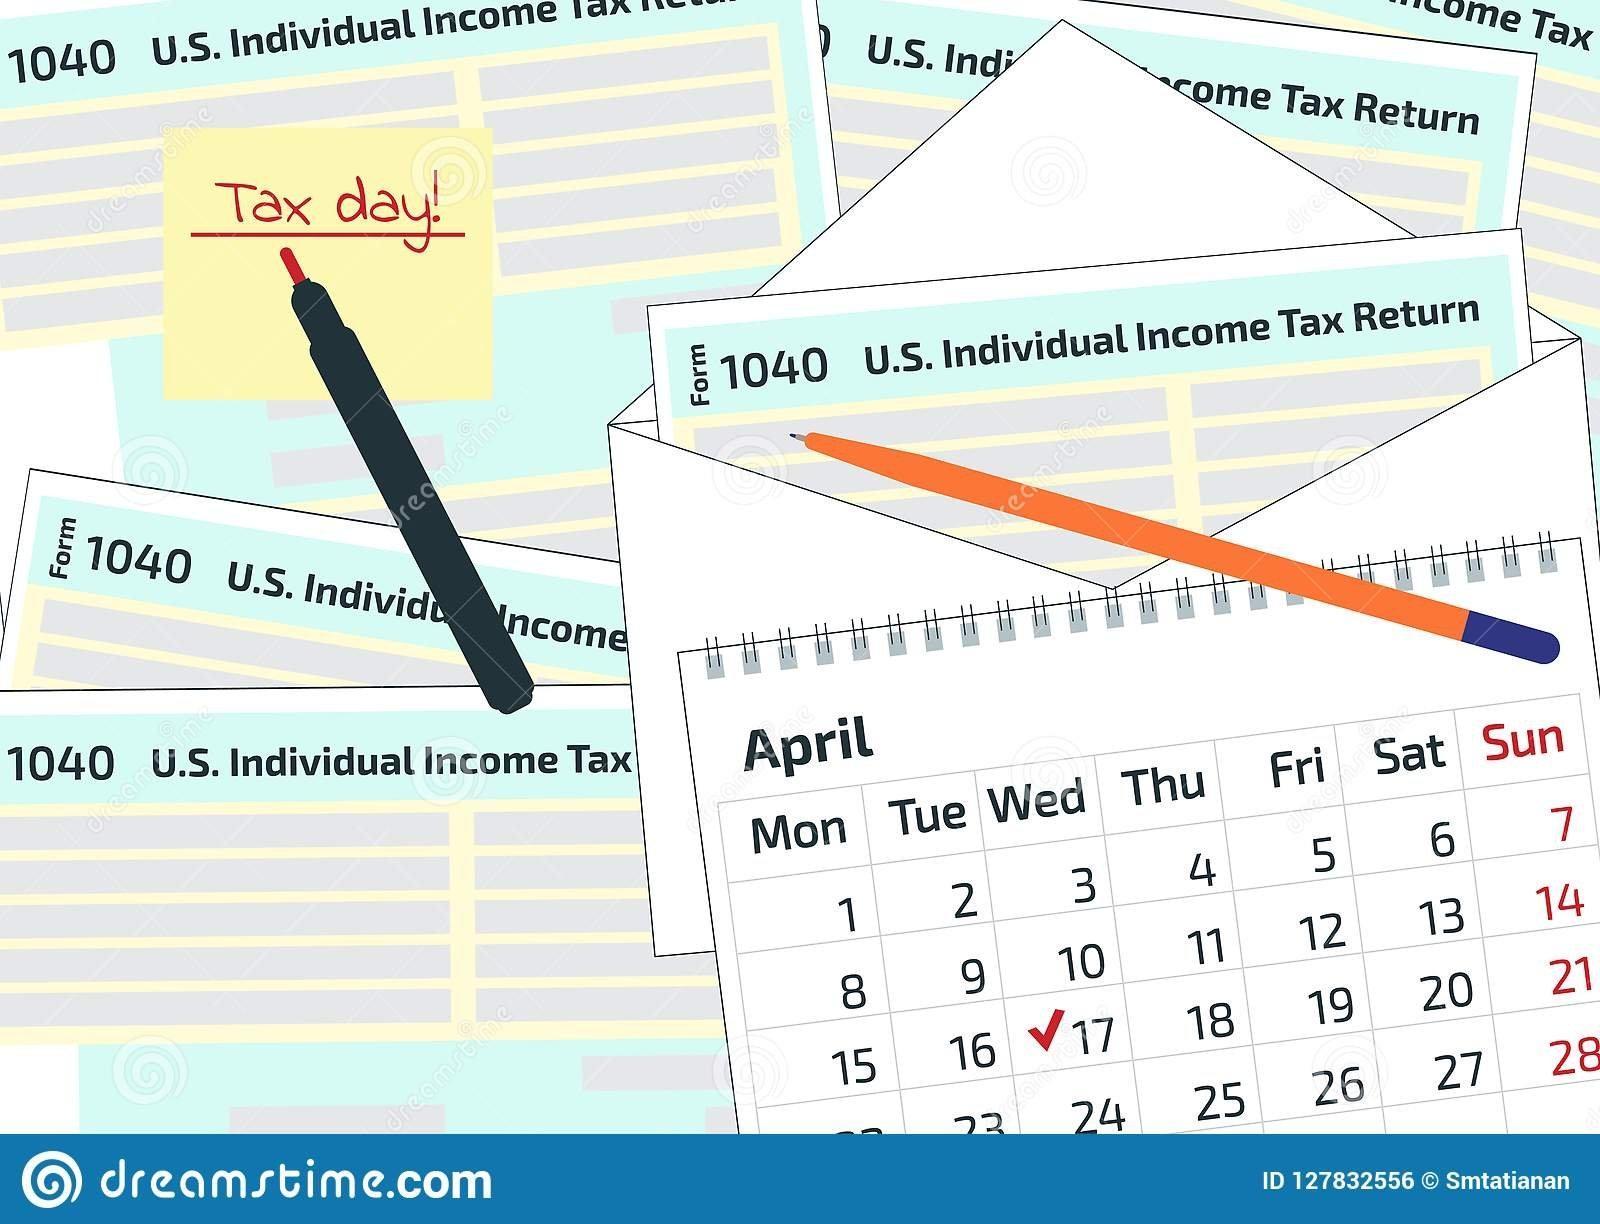 2019, 2020 Tax Form 1040 In The Envelope, A Pen And A Calendar. Tax U Of H Calendar 2019